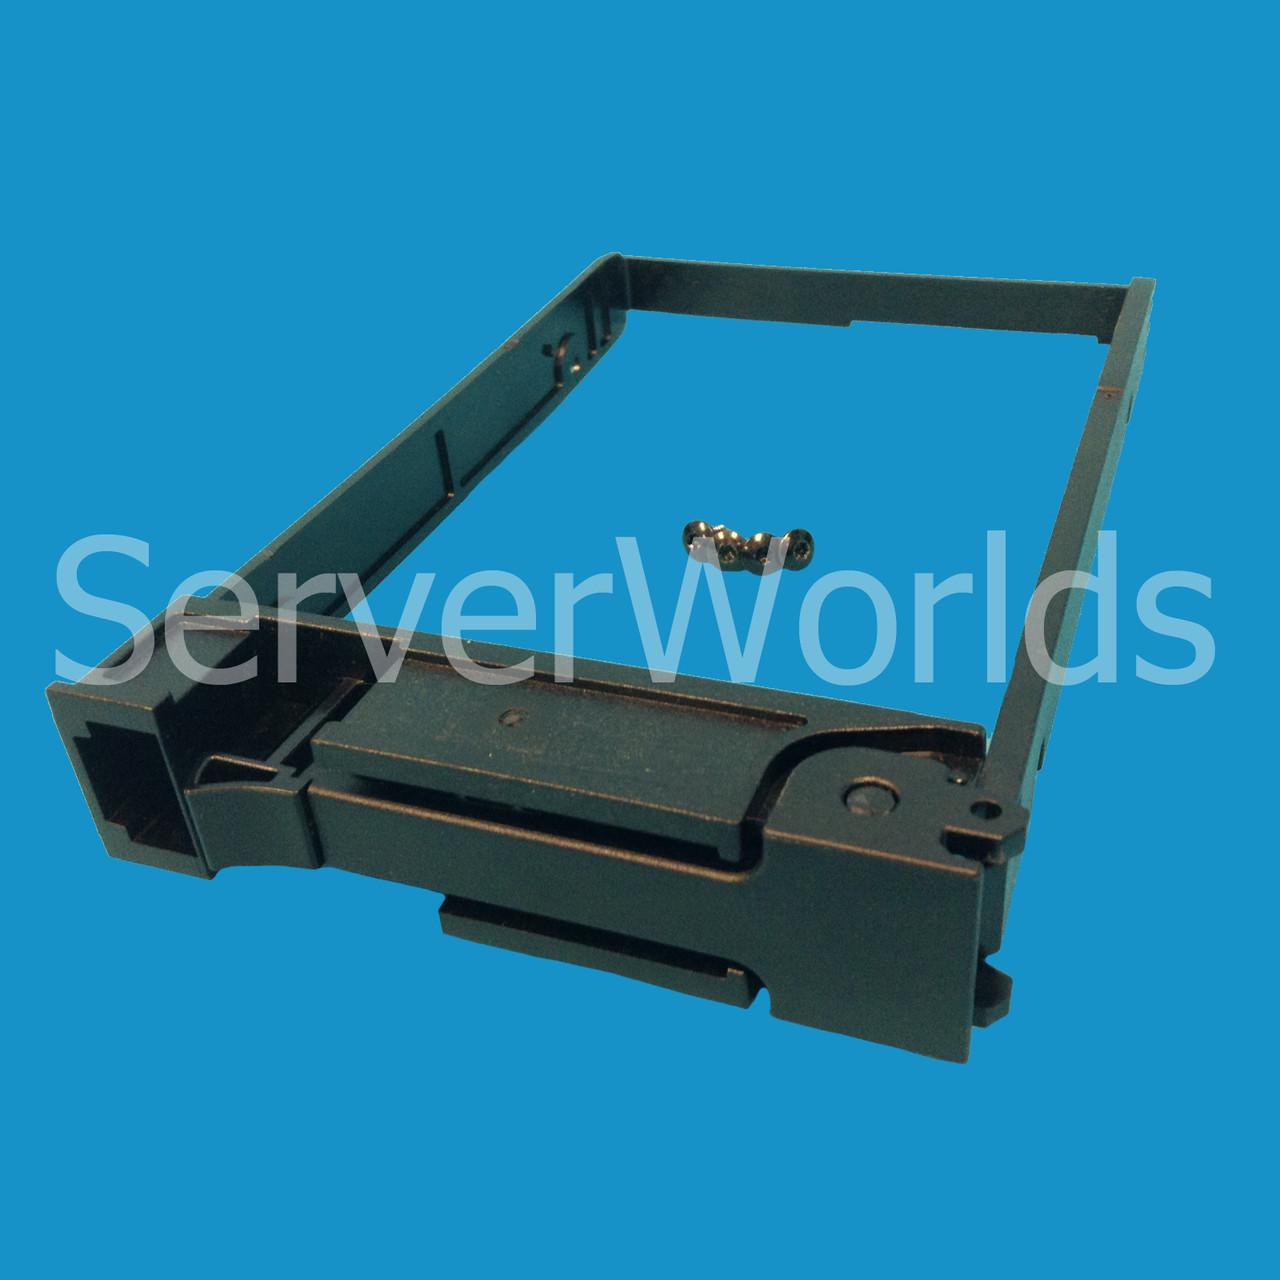 https://cdn2.bigcommerce.com/server900/b18w/products/40024/images/14227/624879_001__13395.1394041906.1280.1280.jpg